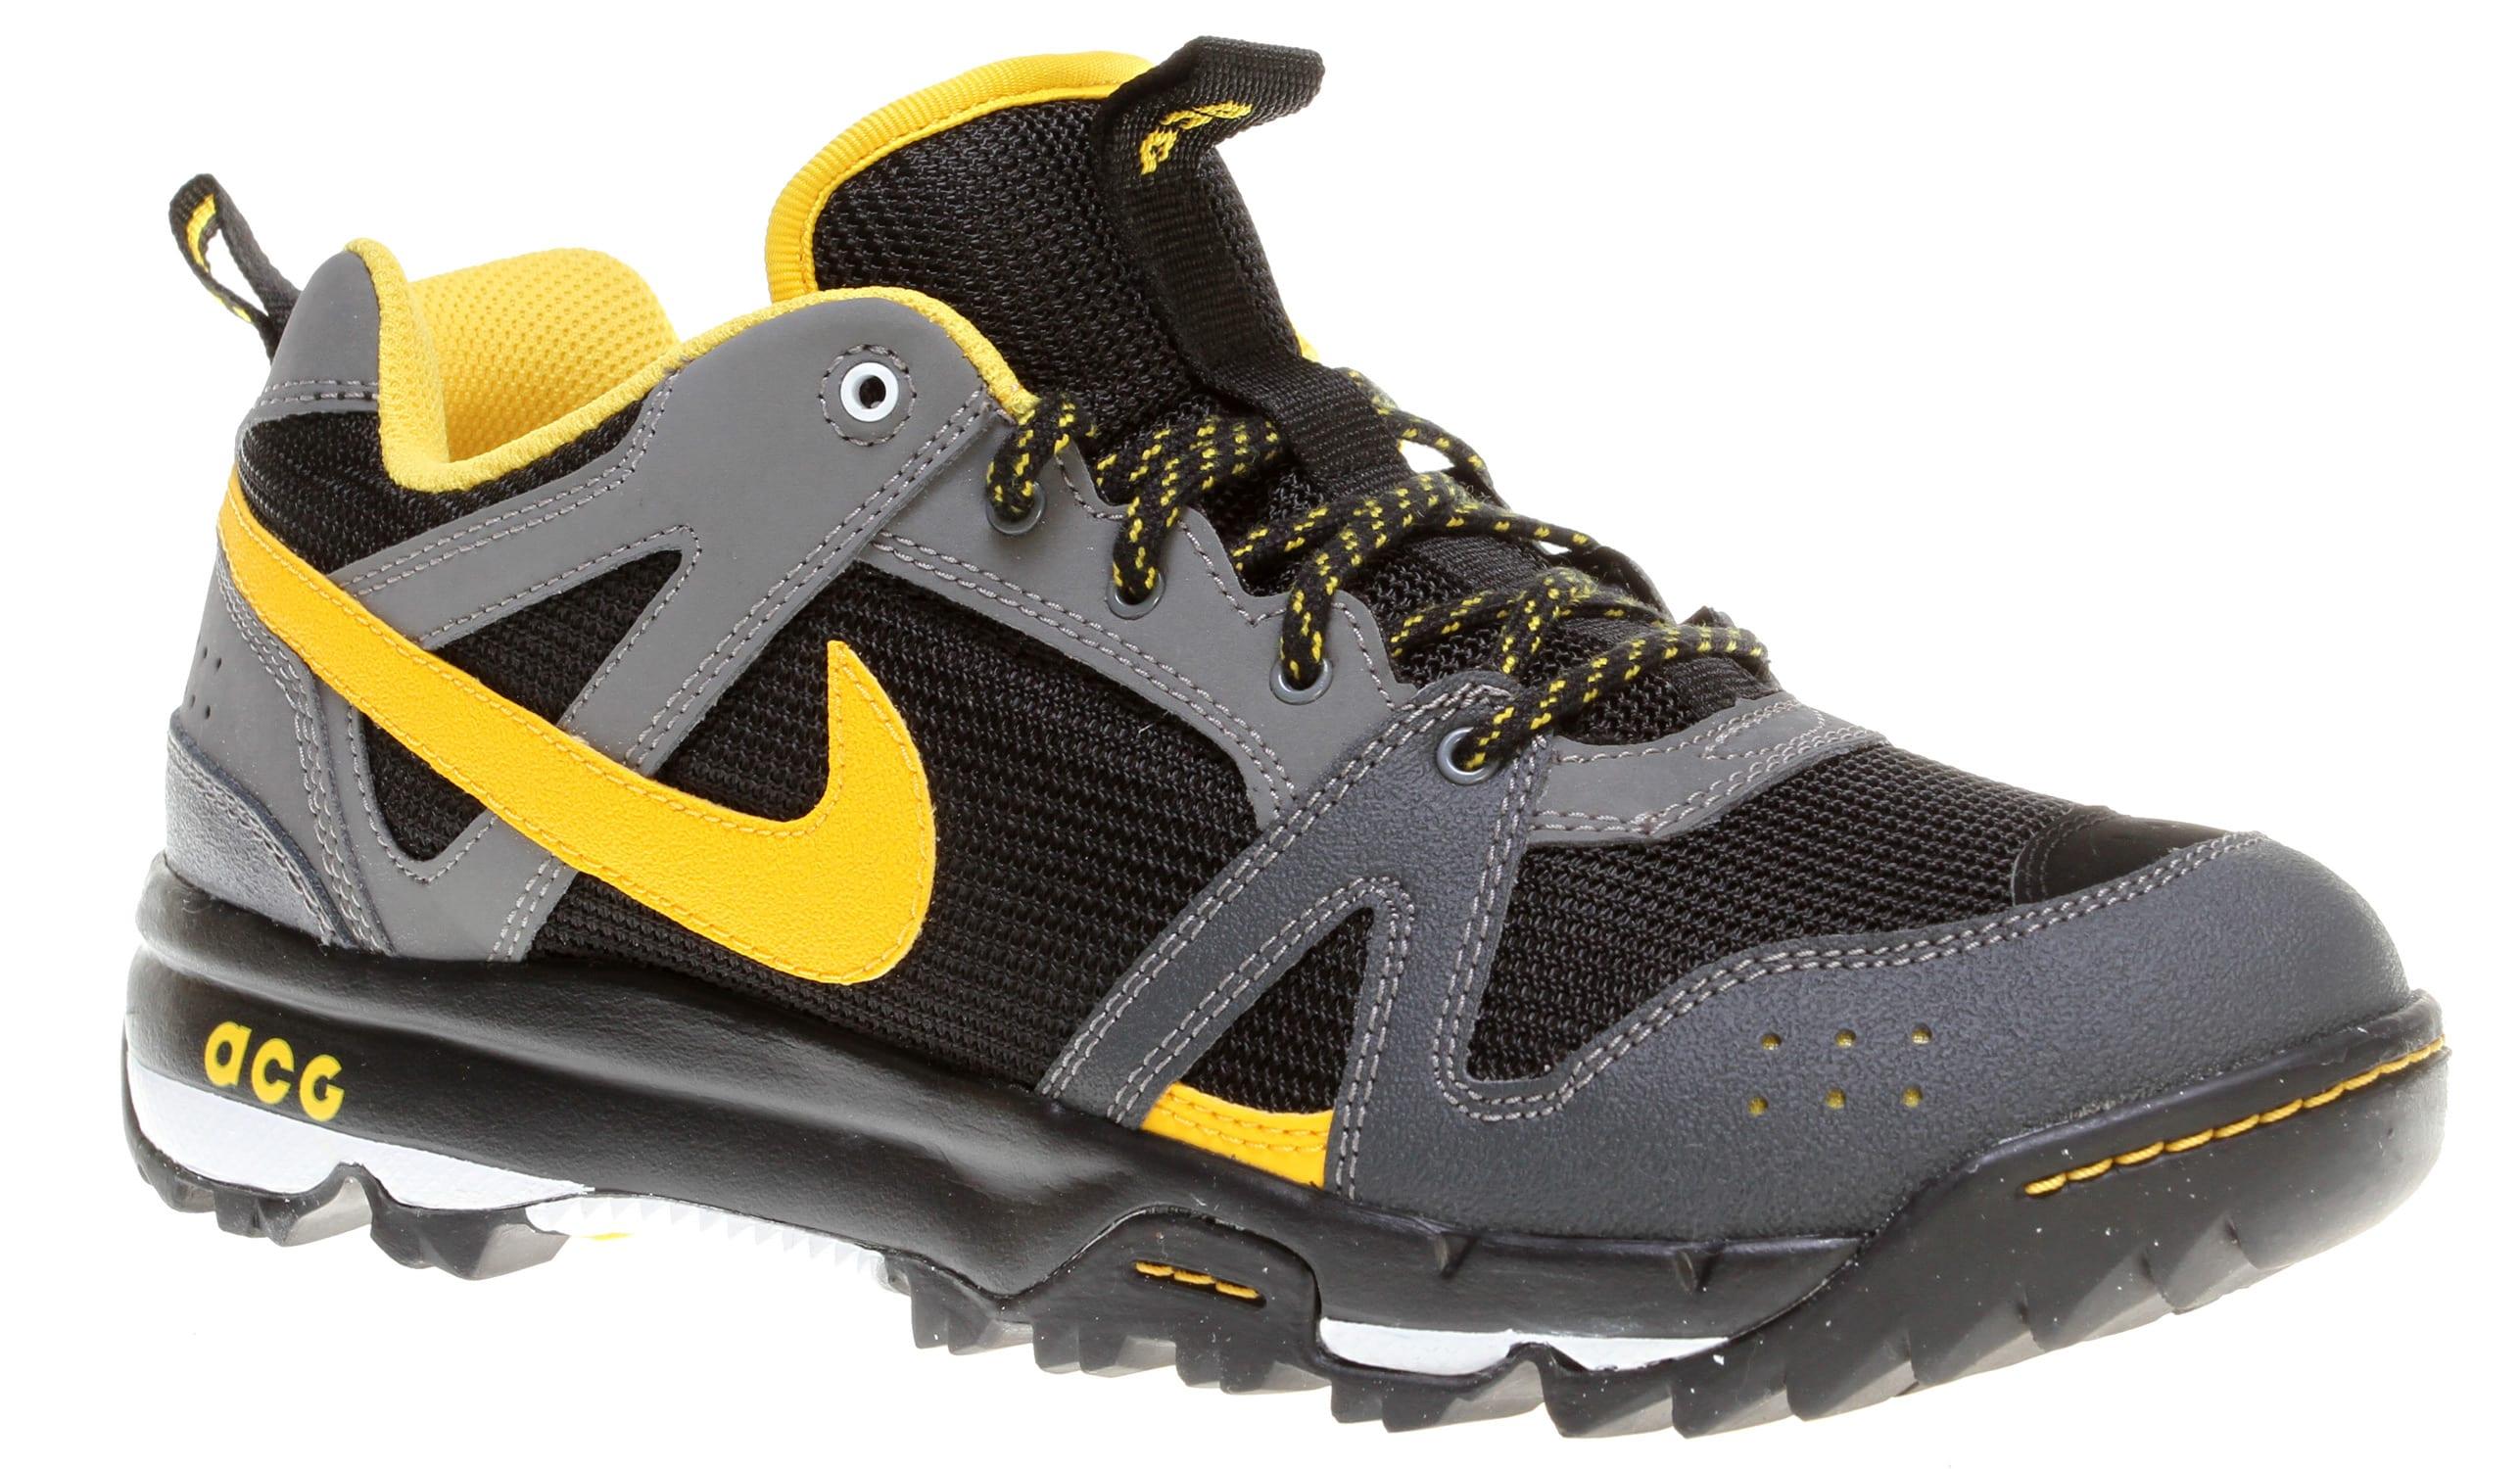 Nike Acg Rongbuk Mens Hiking Shoe